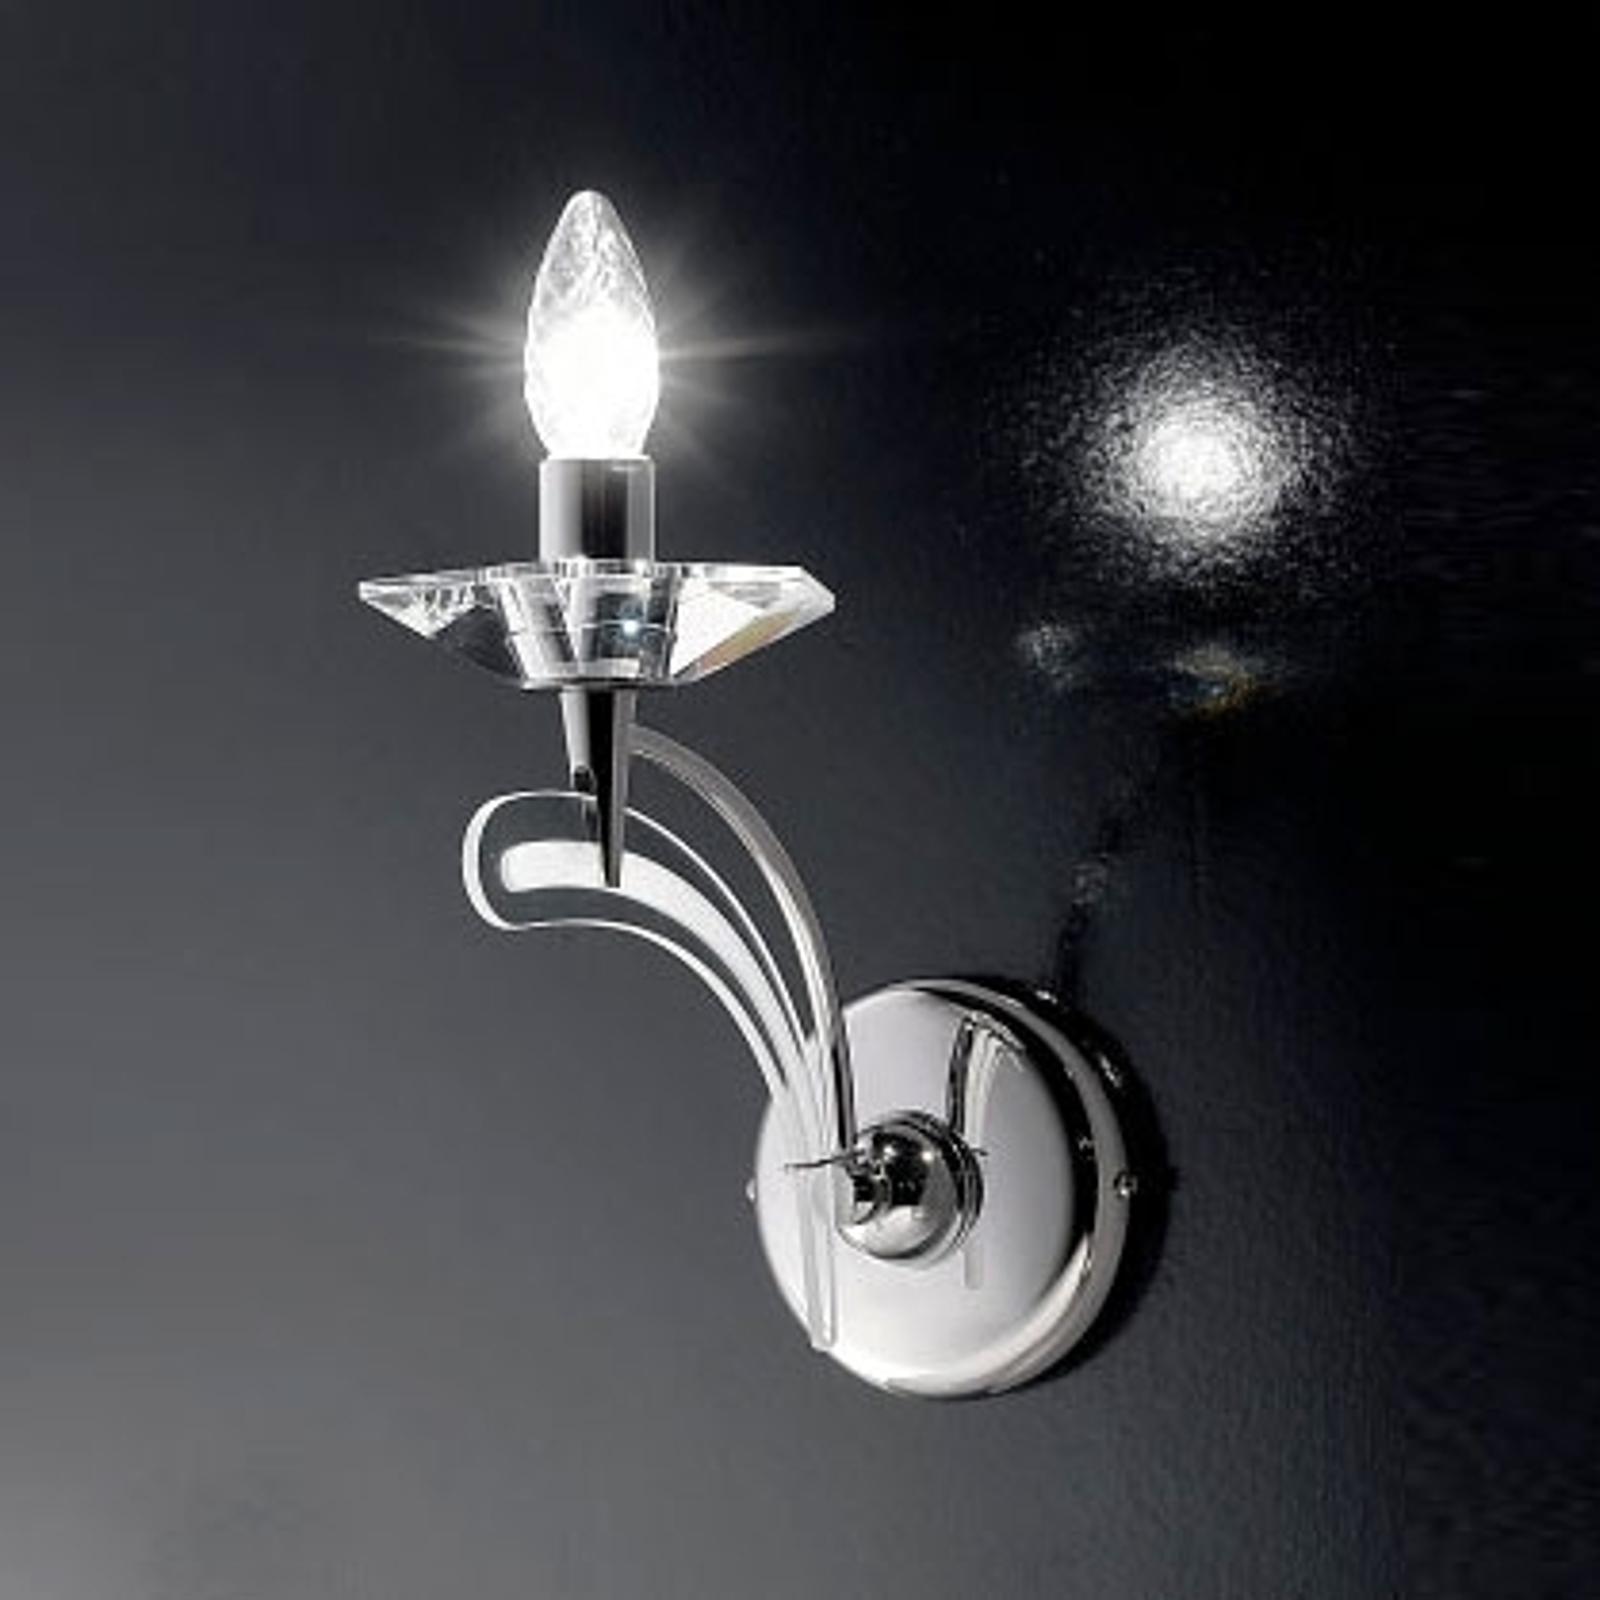 Wandlamp ICARO, 1-lichts met kristalglas, chroom